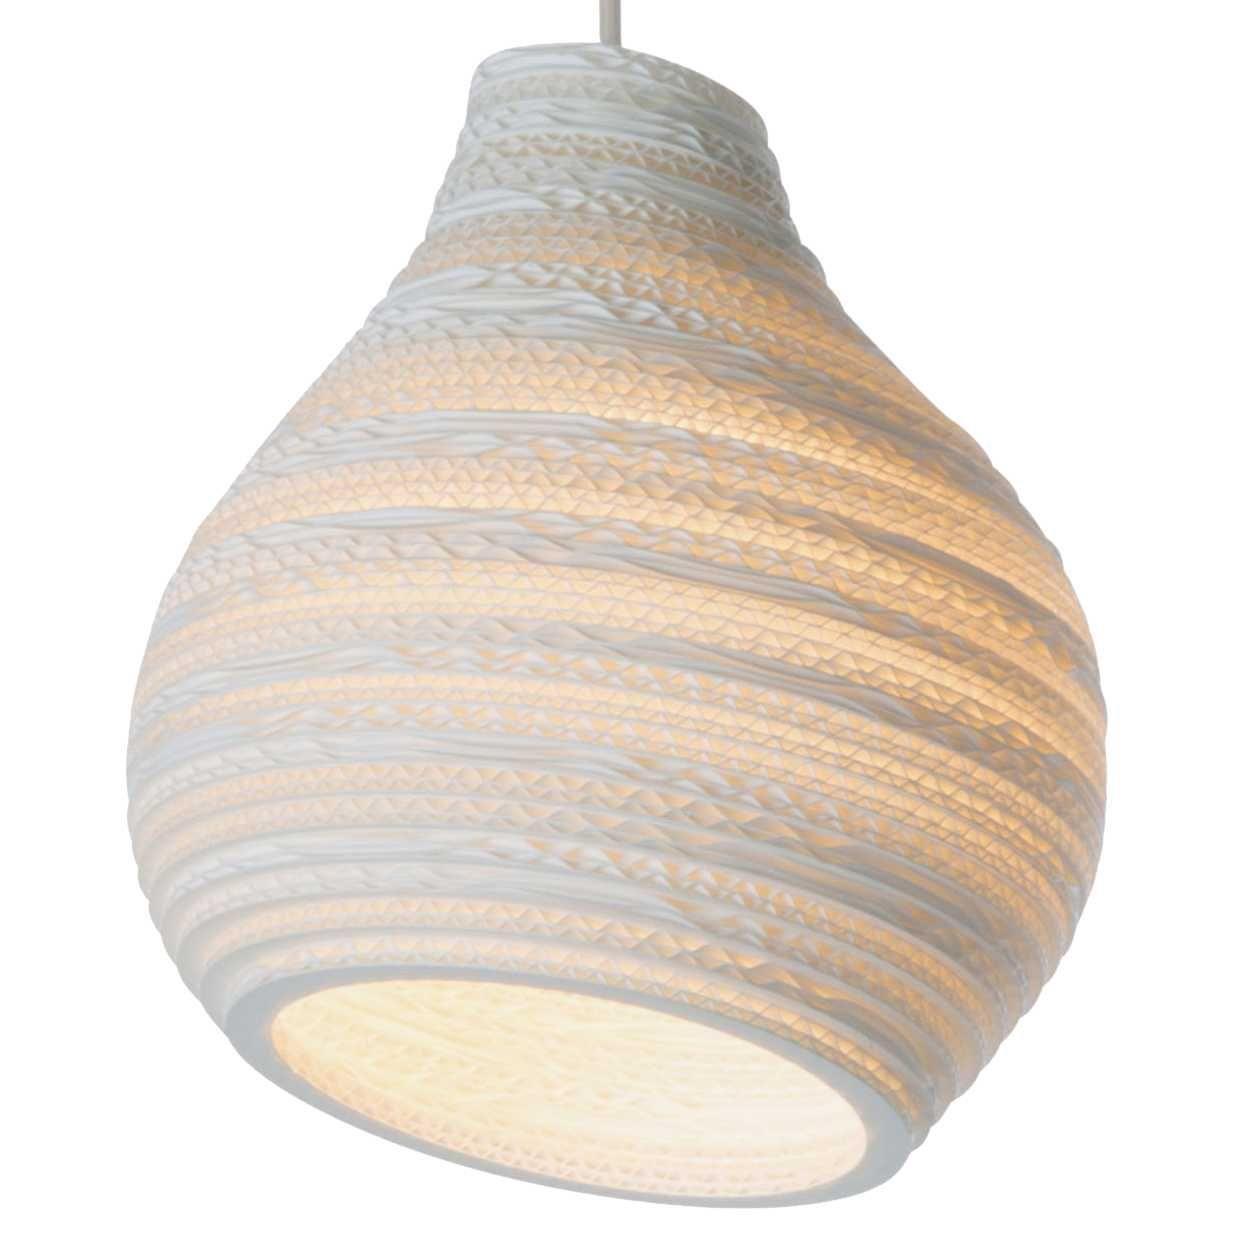 FonQ-Graypants Hive 15 hanglamp wit-aanbieding